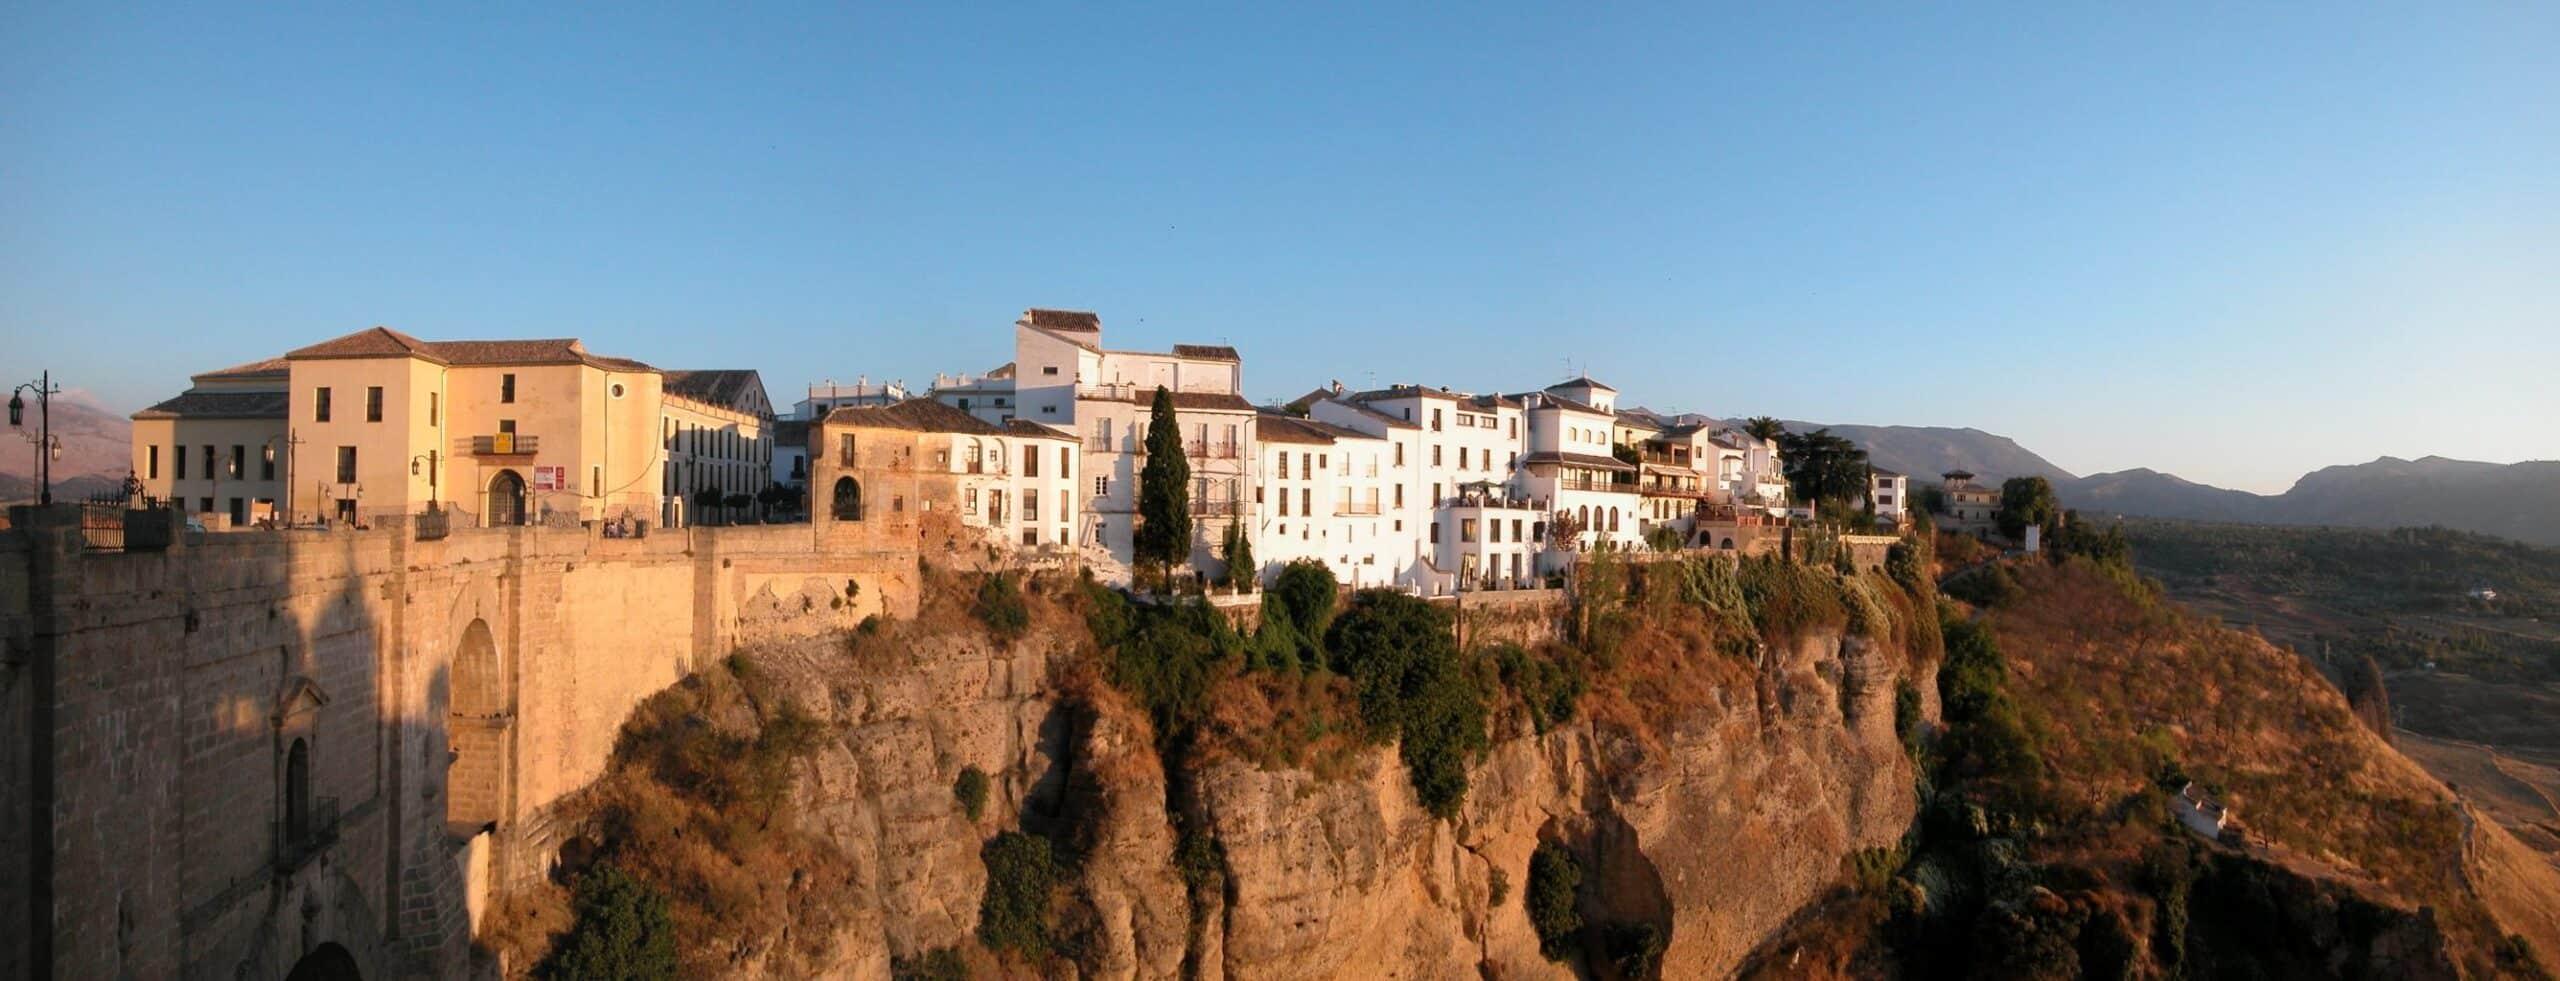 Rondreis Andalusie